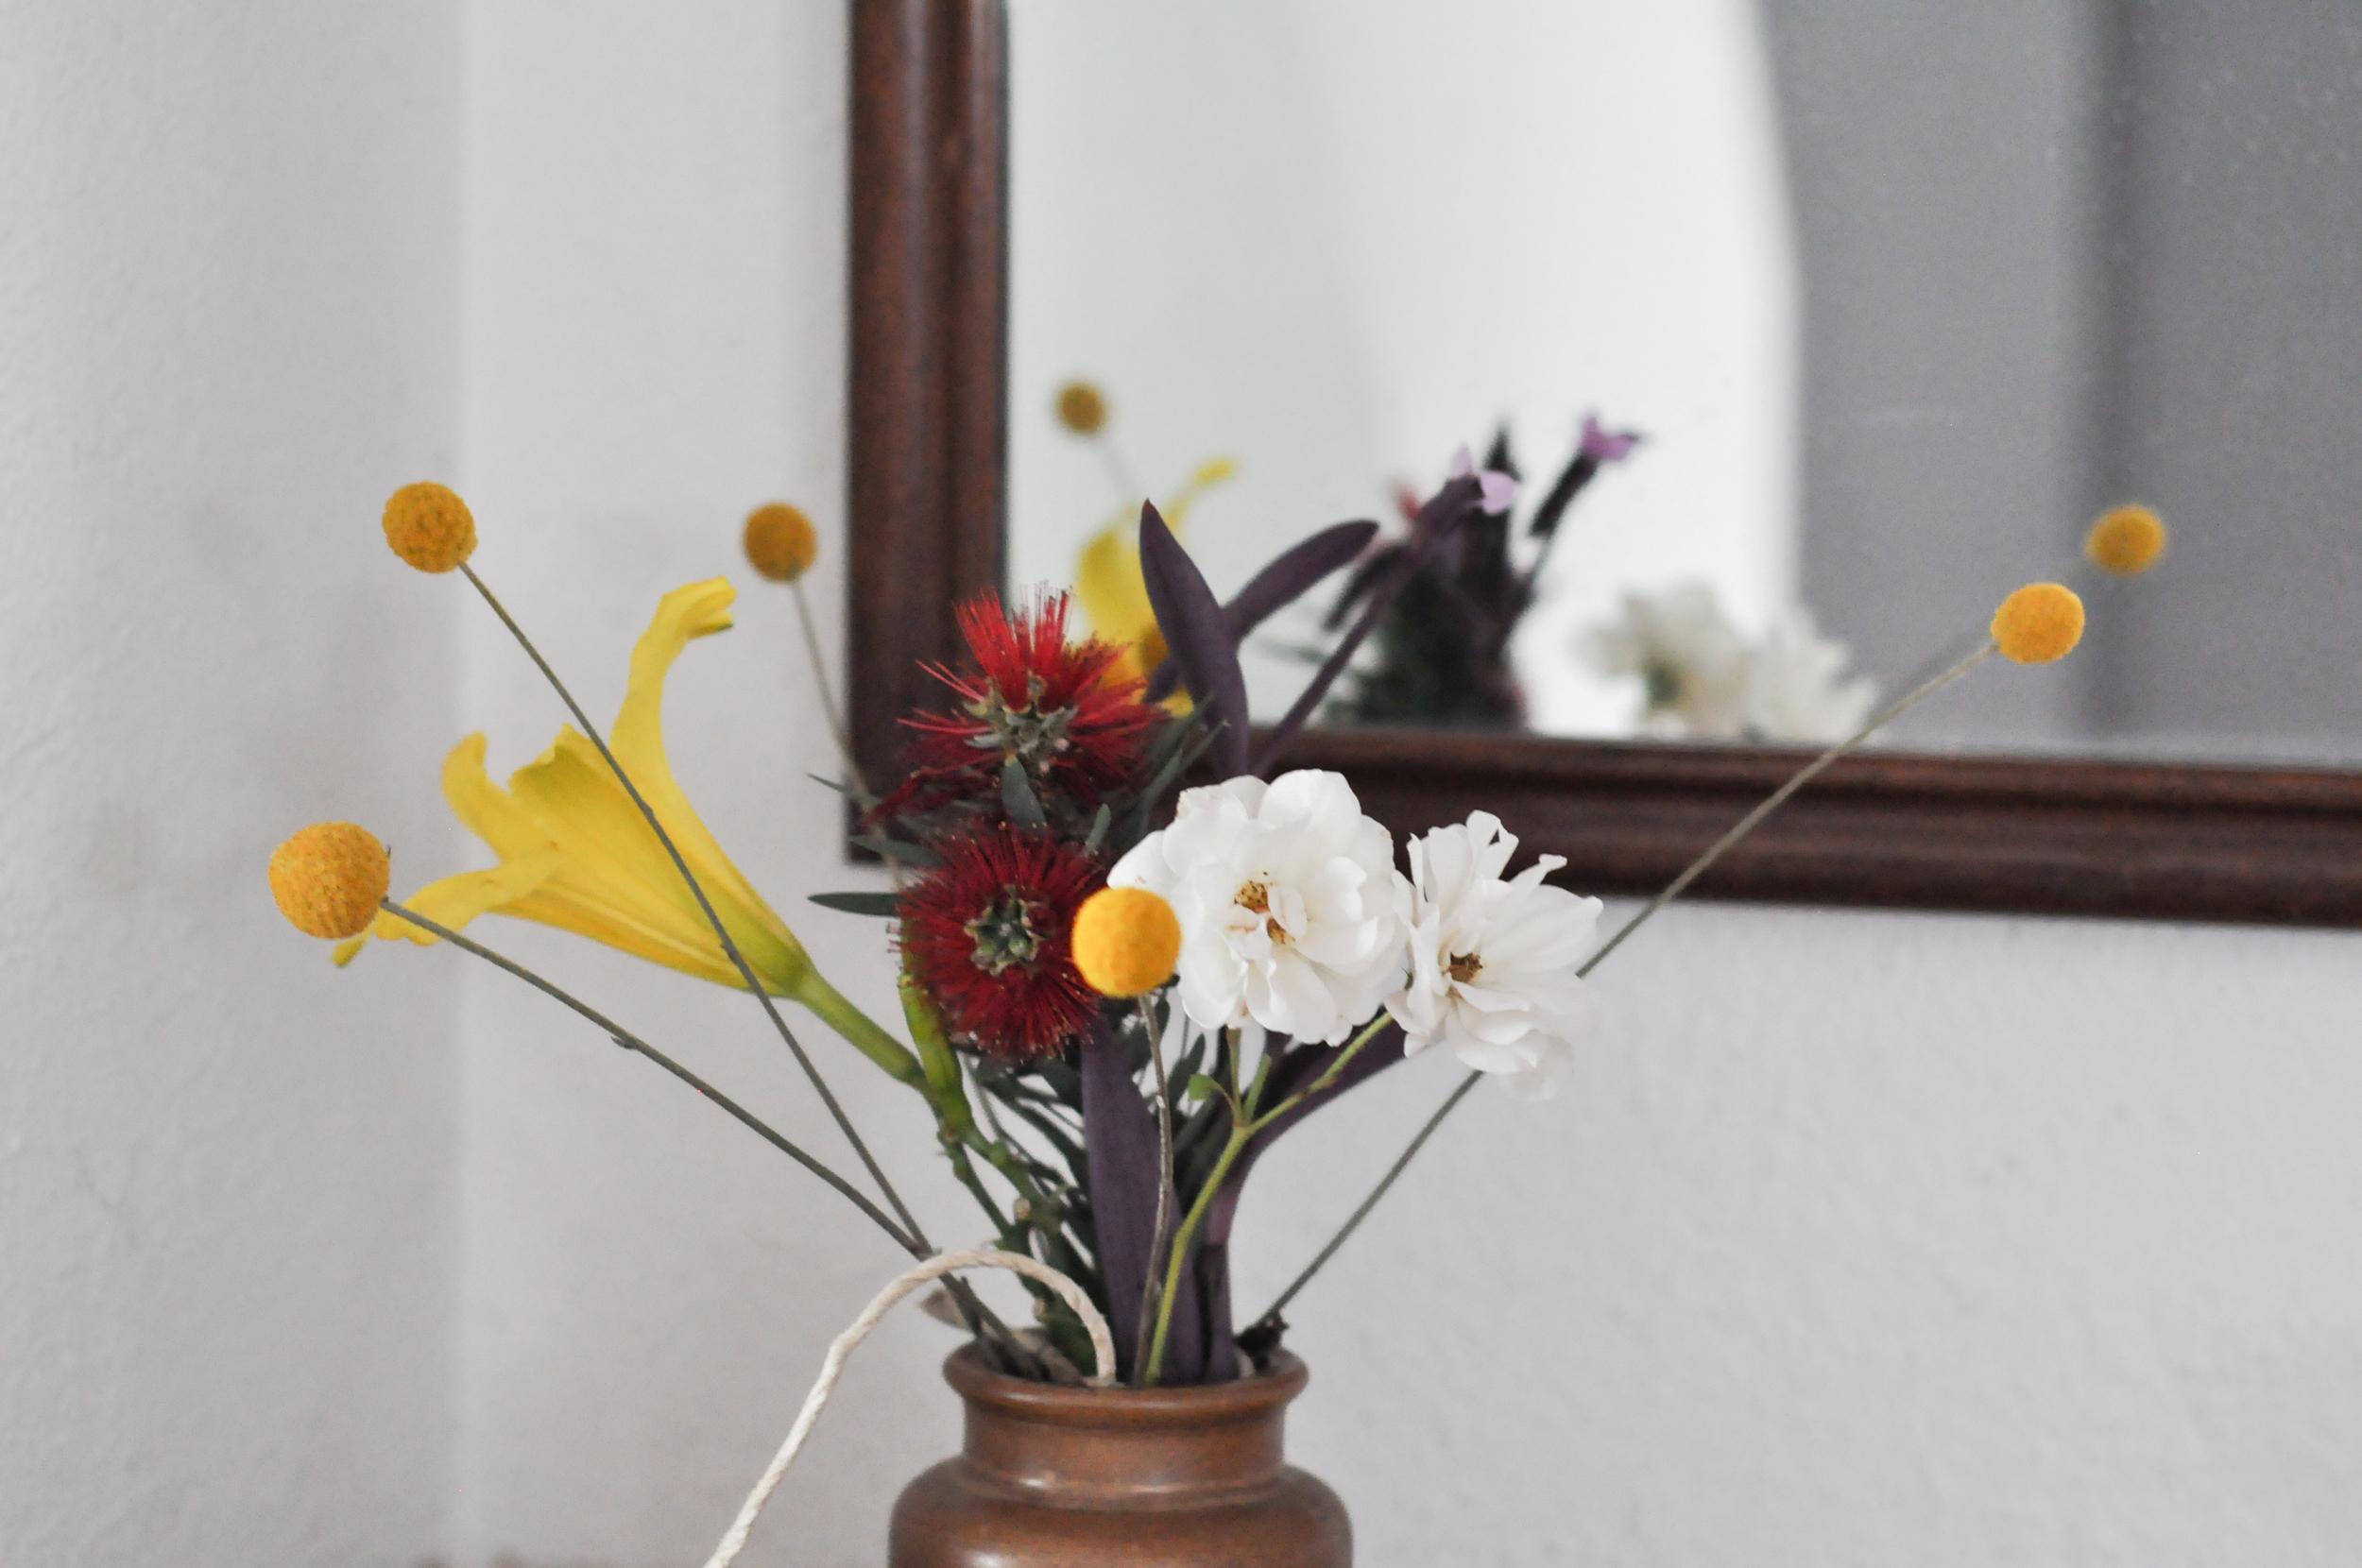 Free-and-native_Shakra_flowers_1.jpg